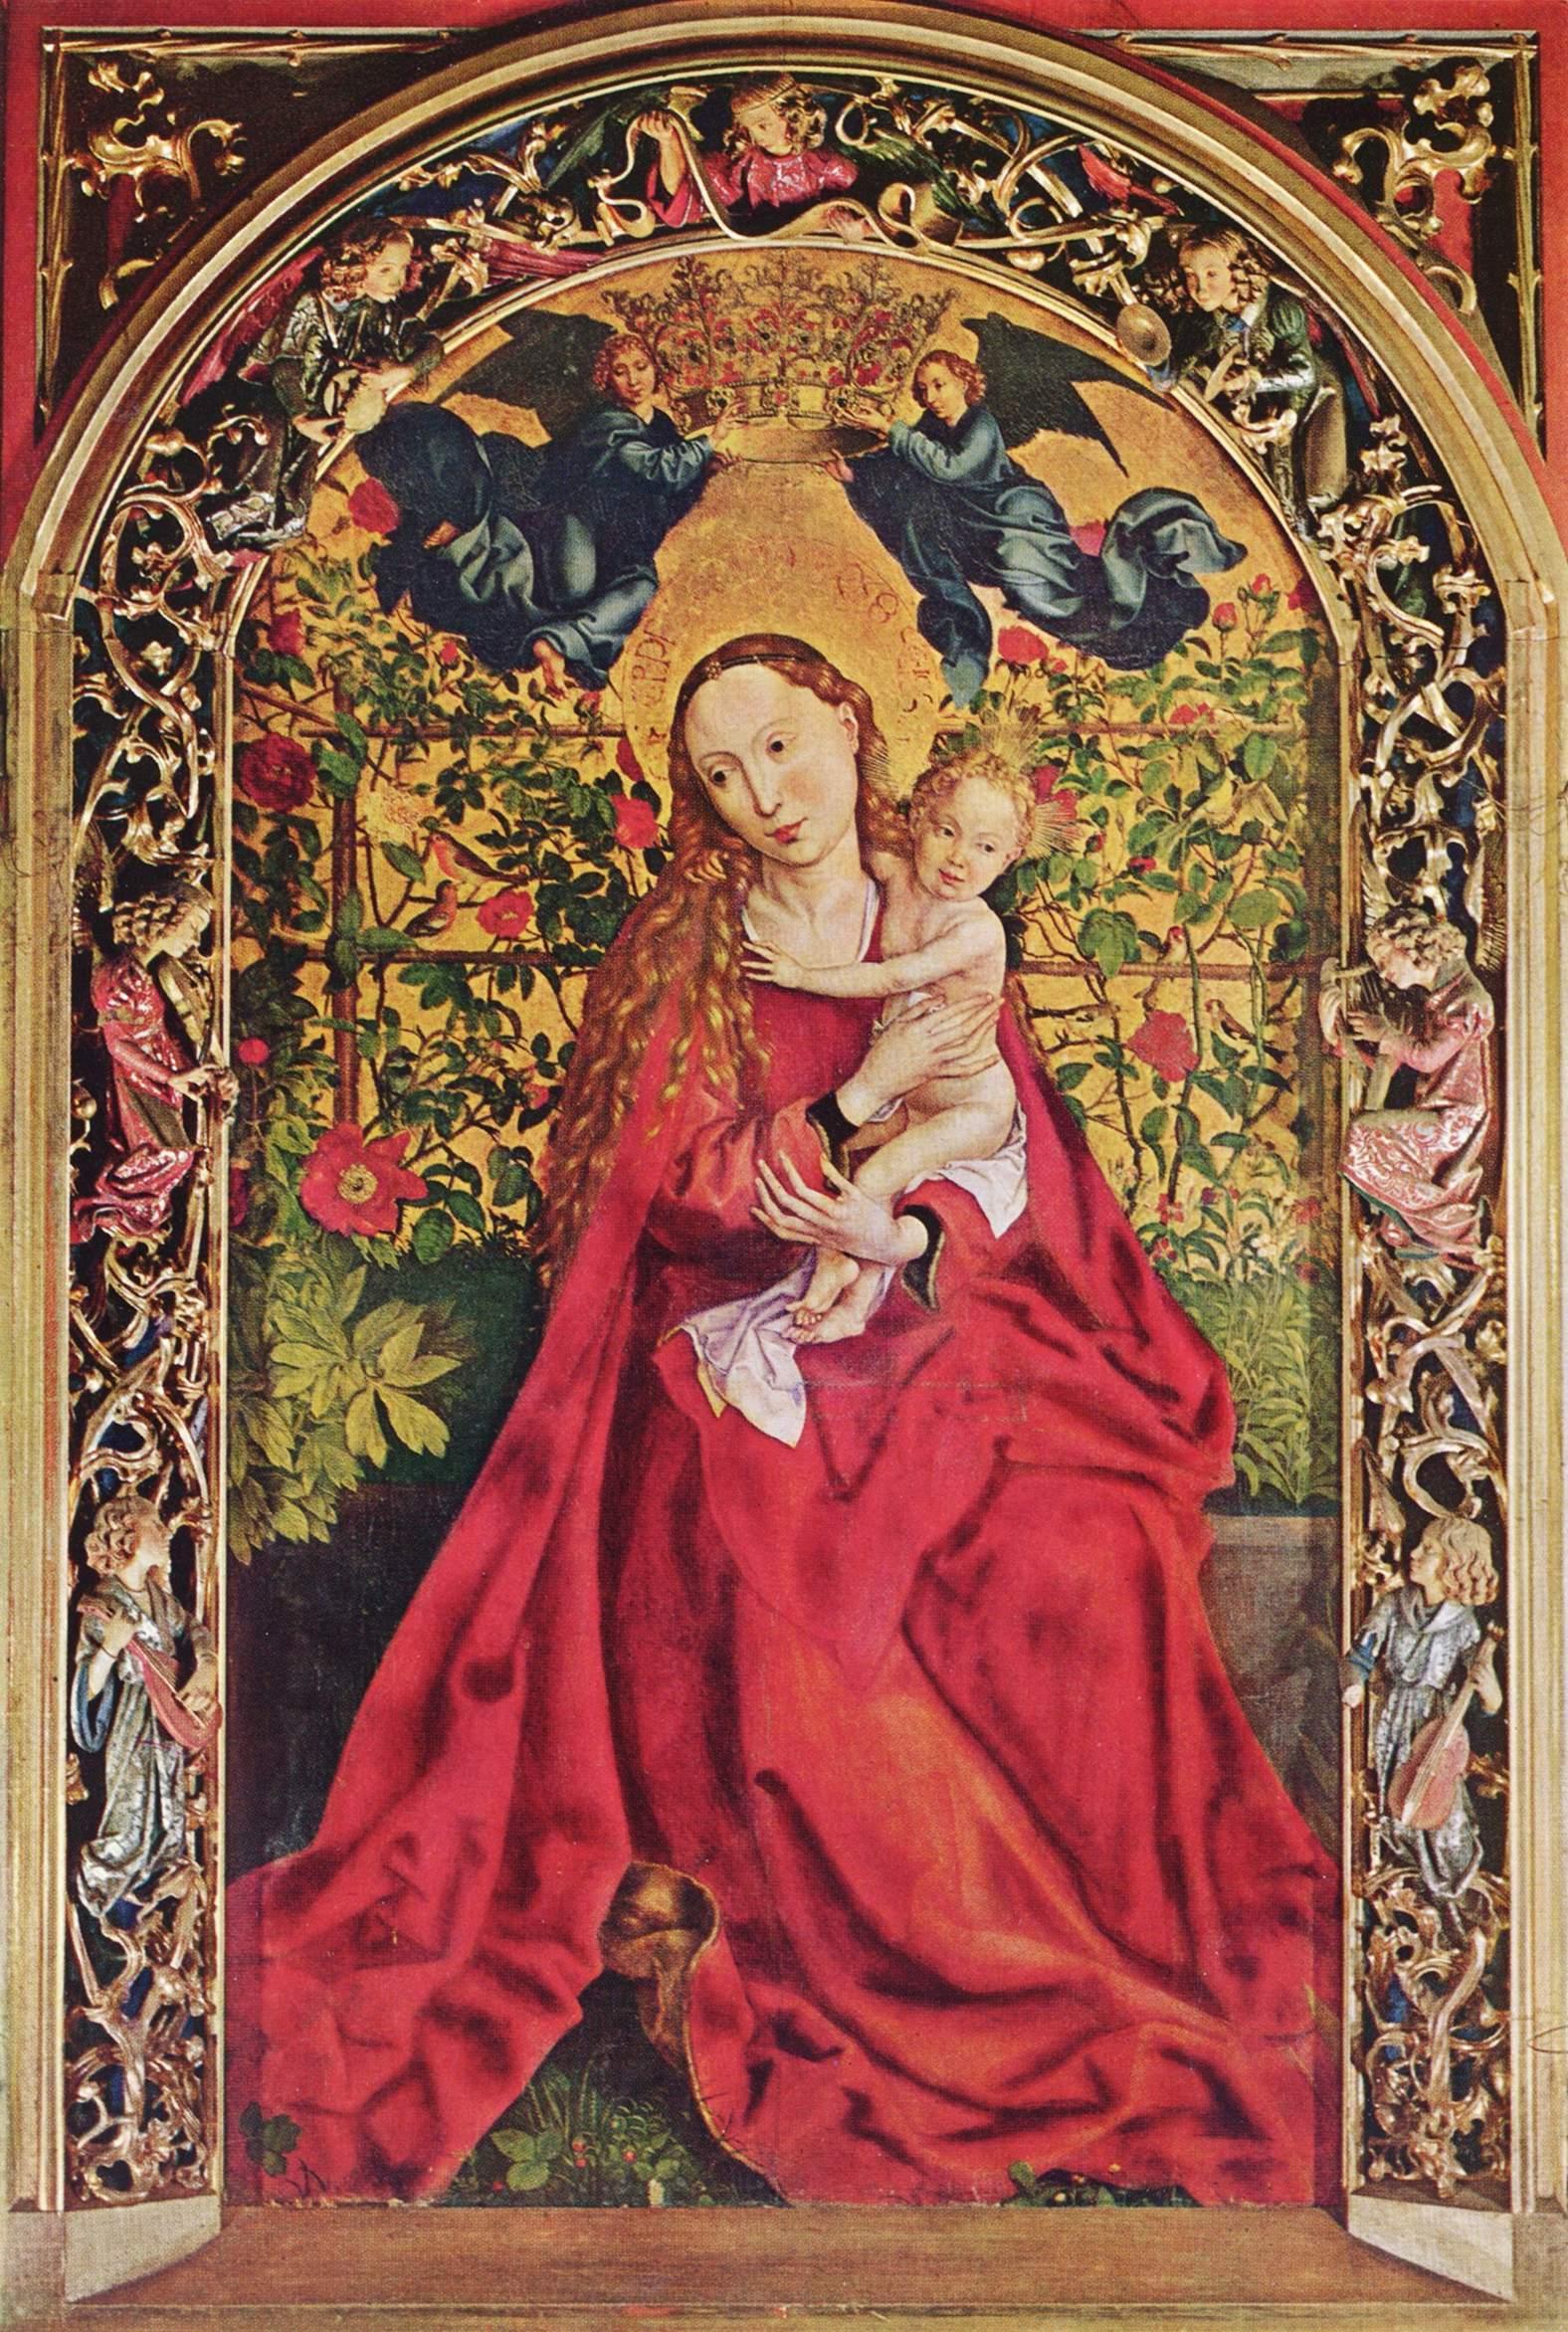 И куда же Мария без роз — символа любви и страданий? Martin Schongauer, Maria im Rosenhag, 1473, Tempera auf Holz, Colmar, Dominikanerkirche